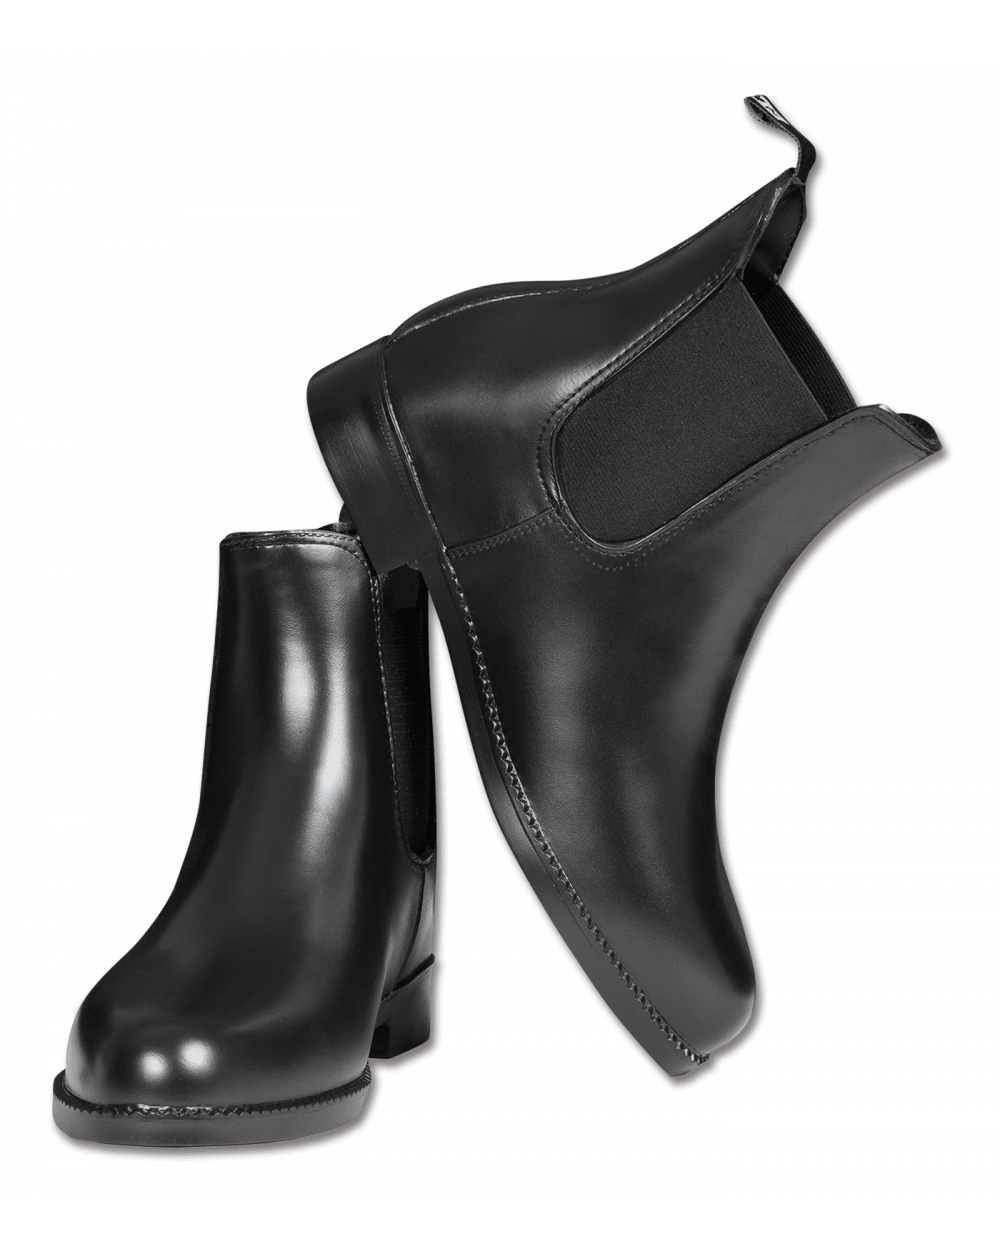 Boots Anglaise classique